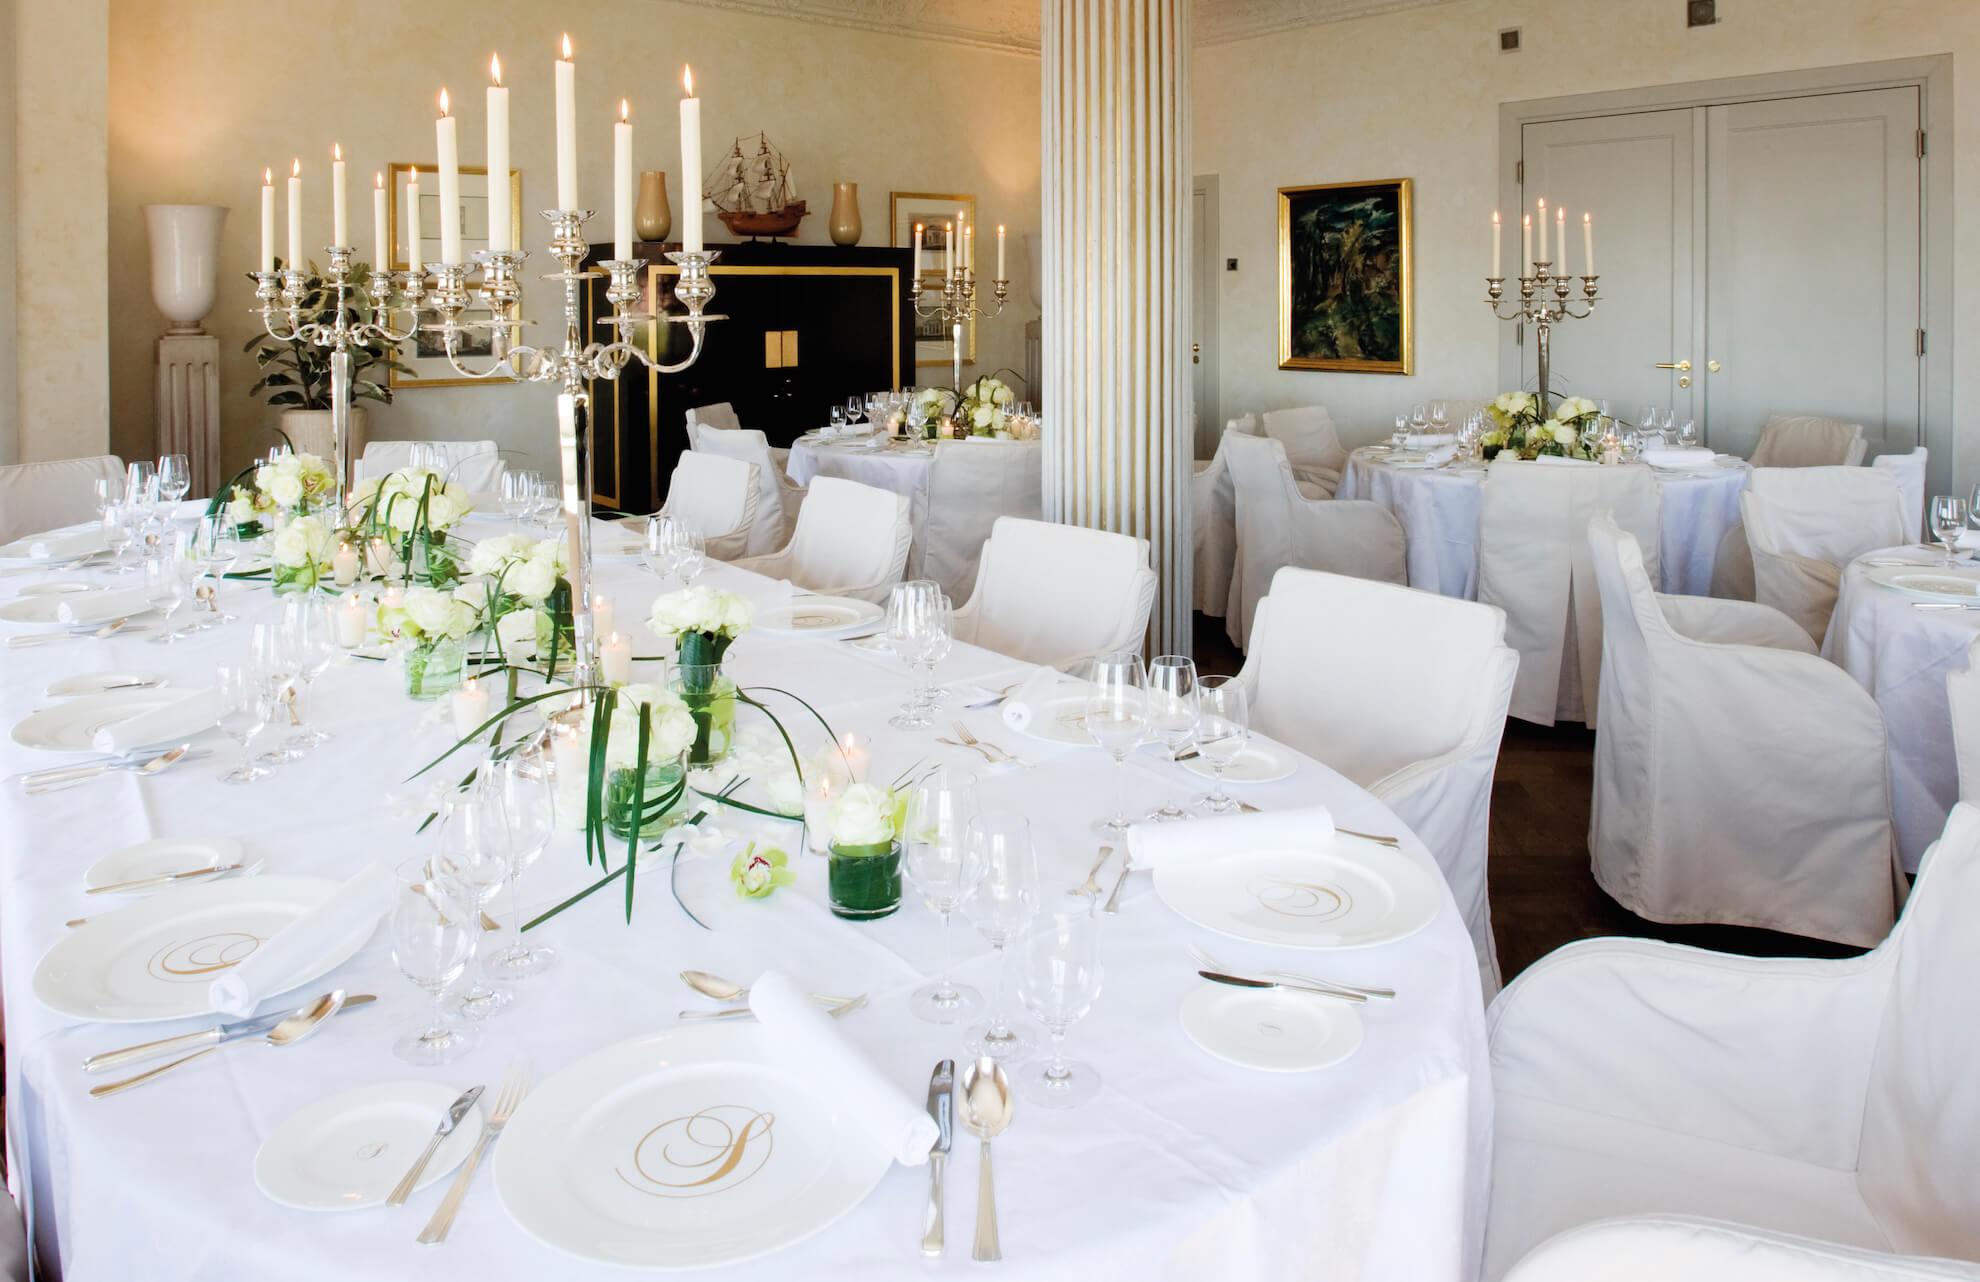 Ihre Private Dining Location in Hamburg